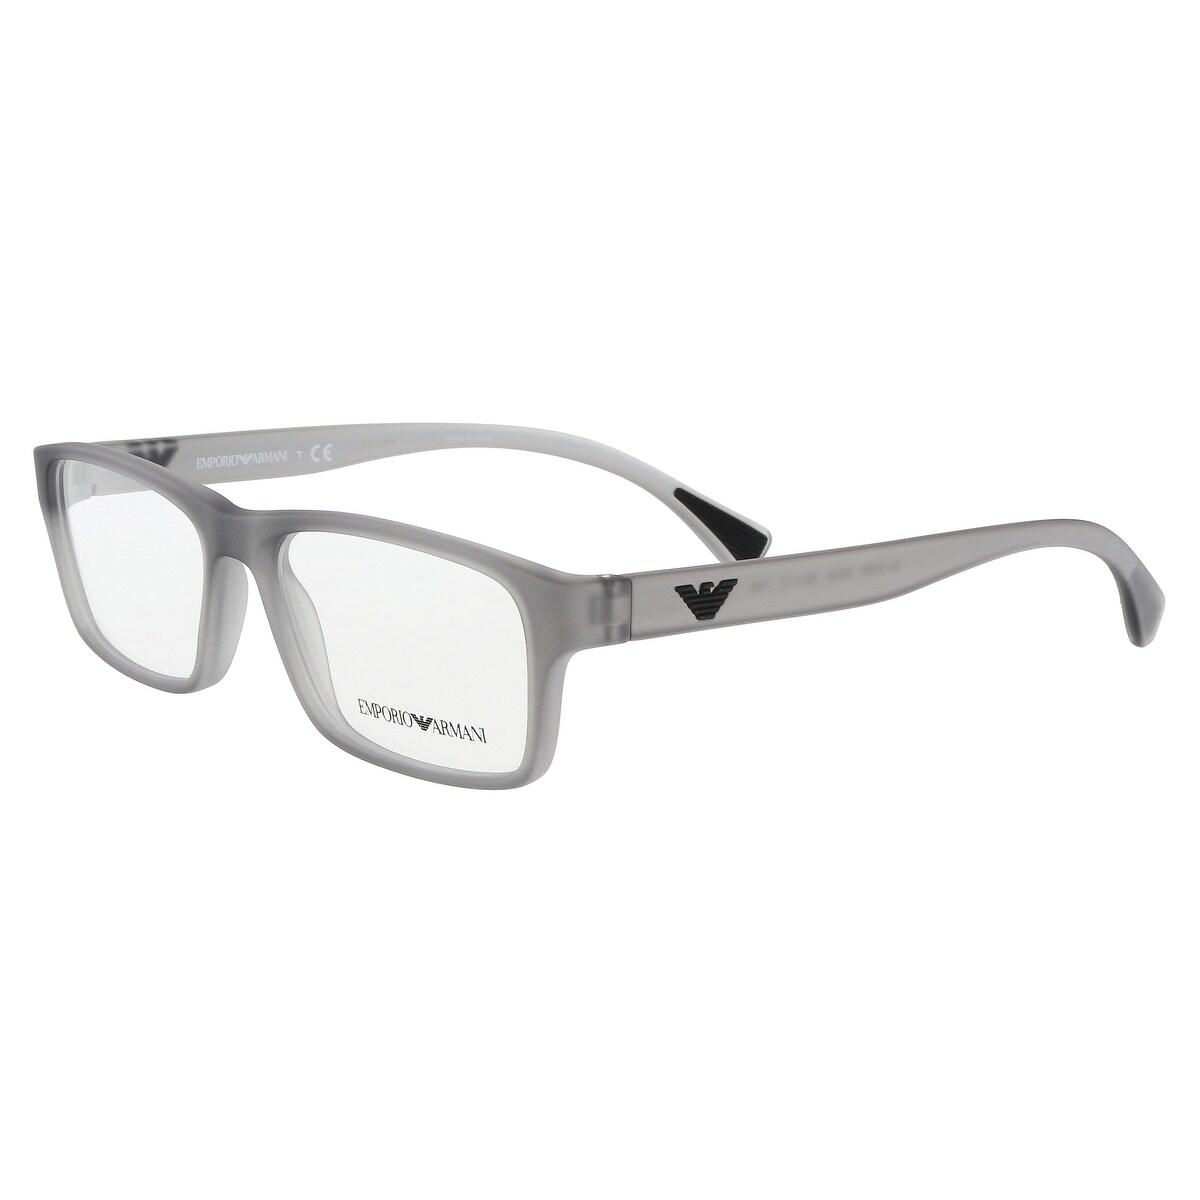 7bf63fb5d21 Shop Emporio Armani EA3088 5532 Light Grey Rectangle Opticals - Free ...